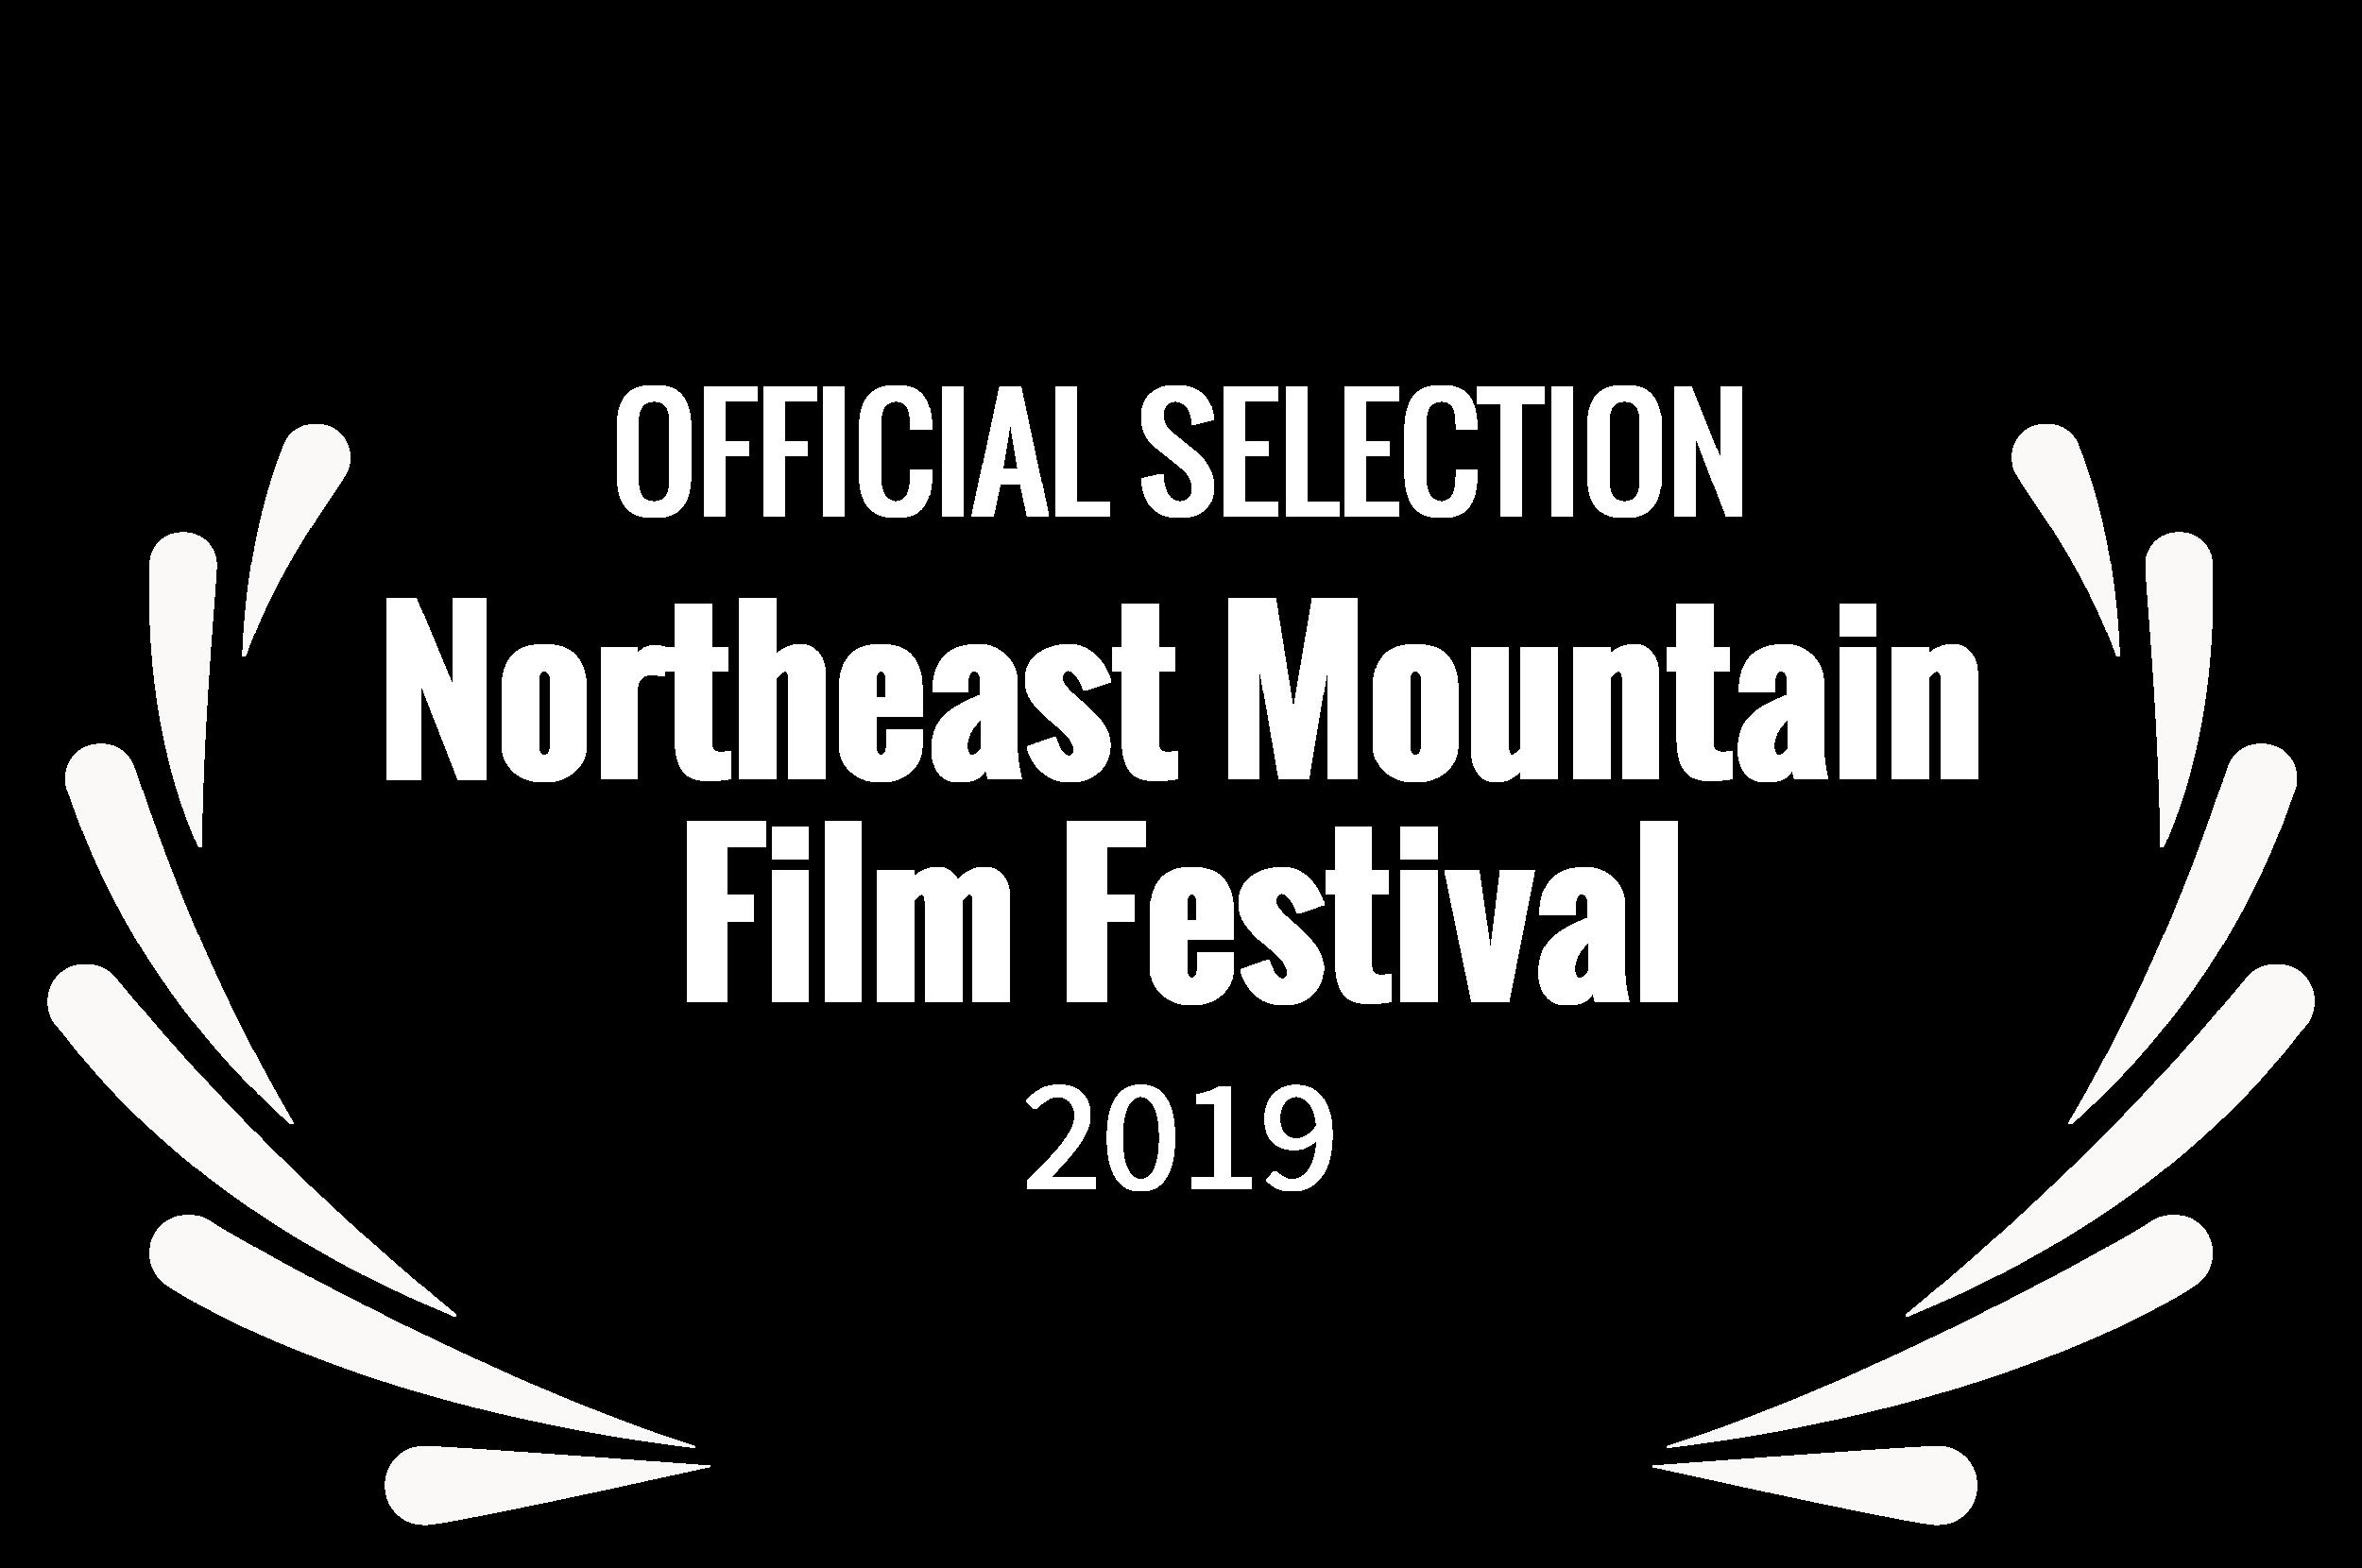 OFFICIALSELECTION-NortheastMountainFilmFestival-2019.png